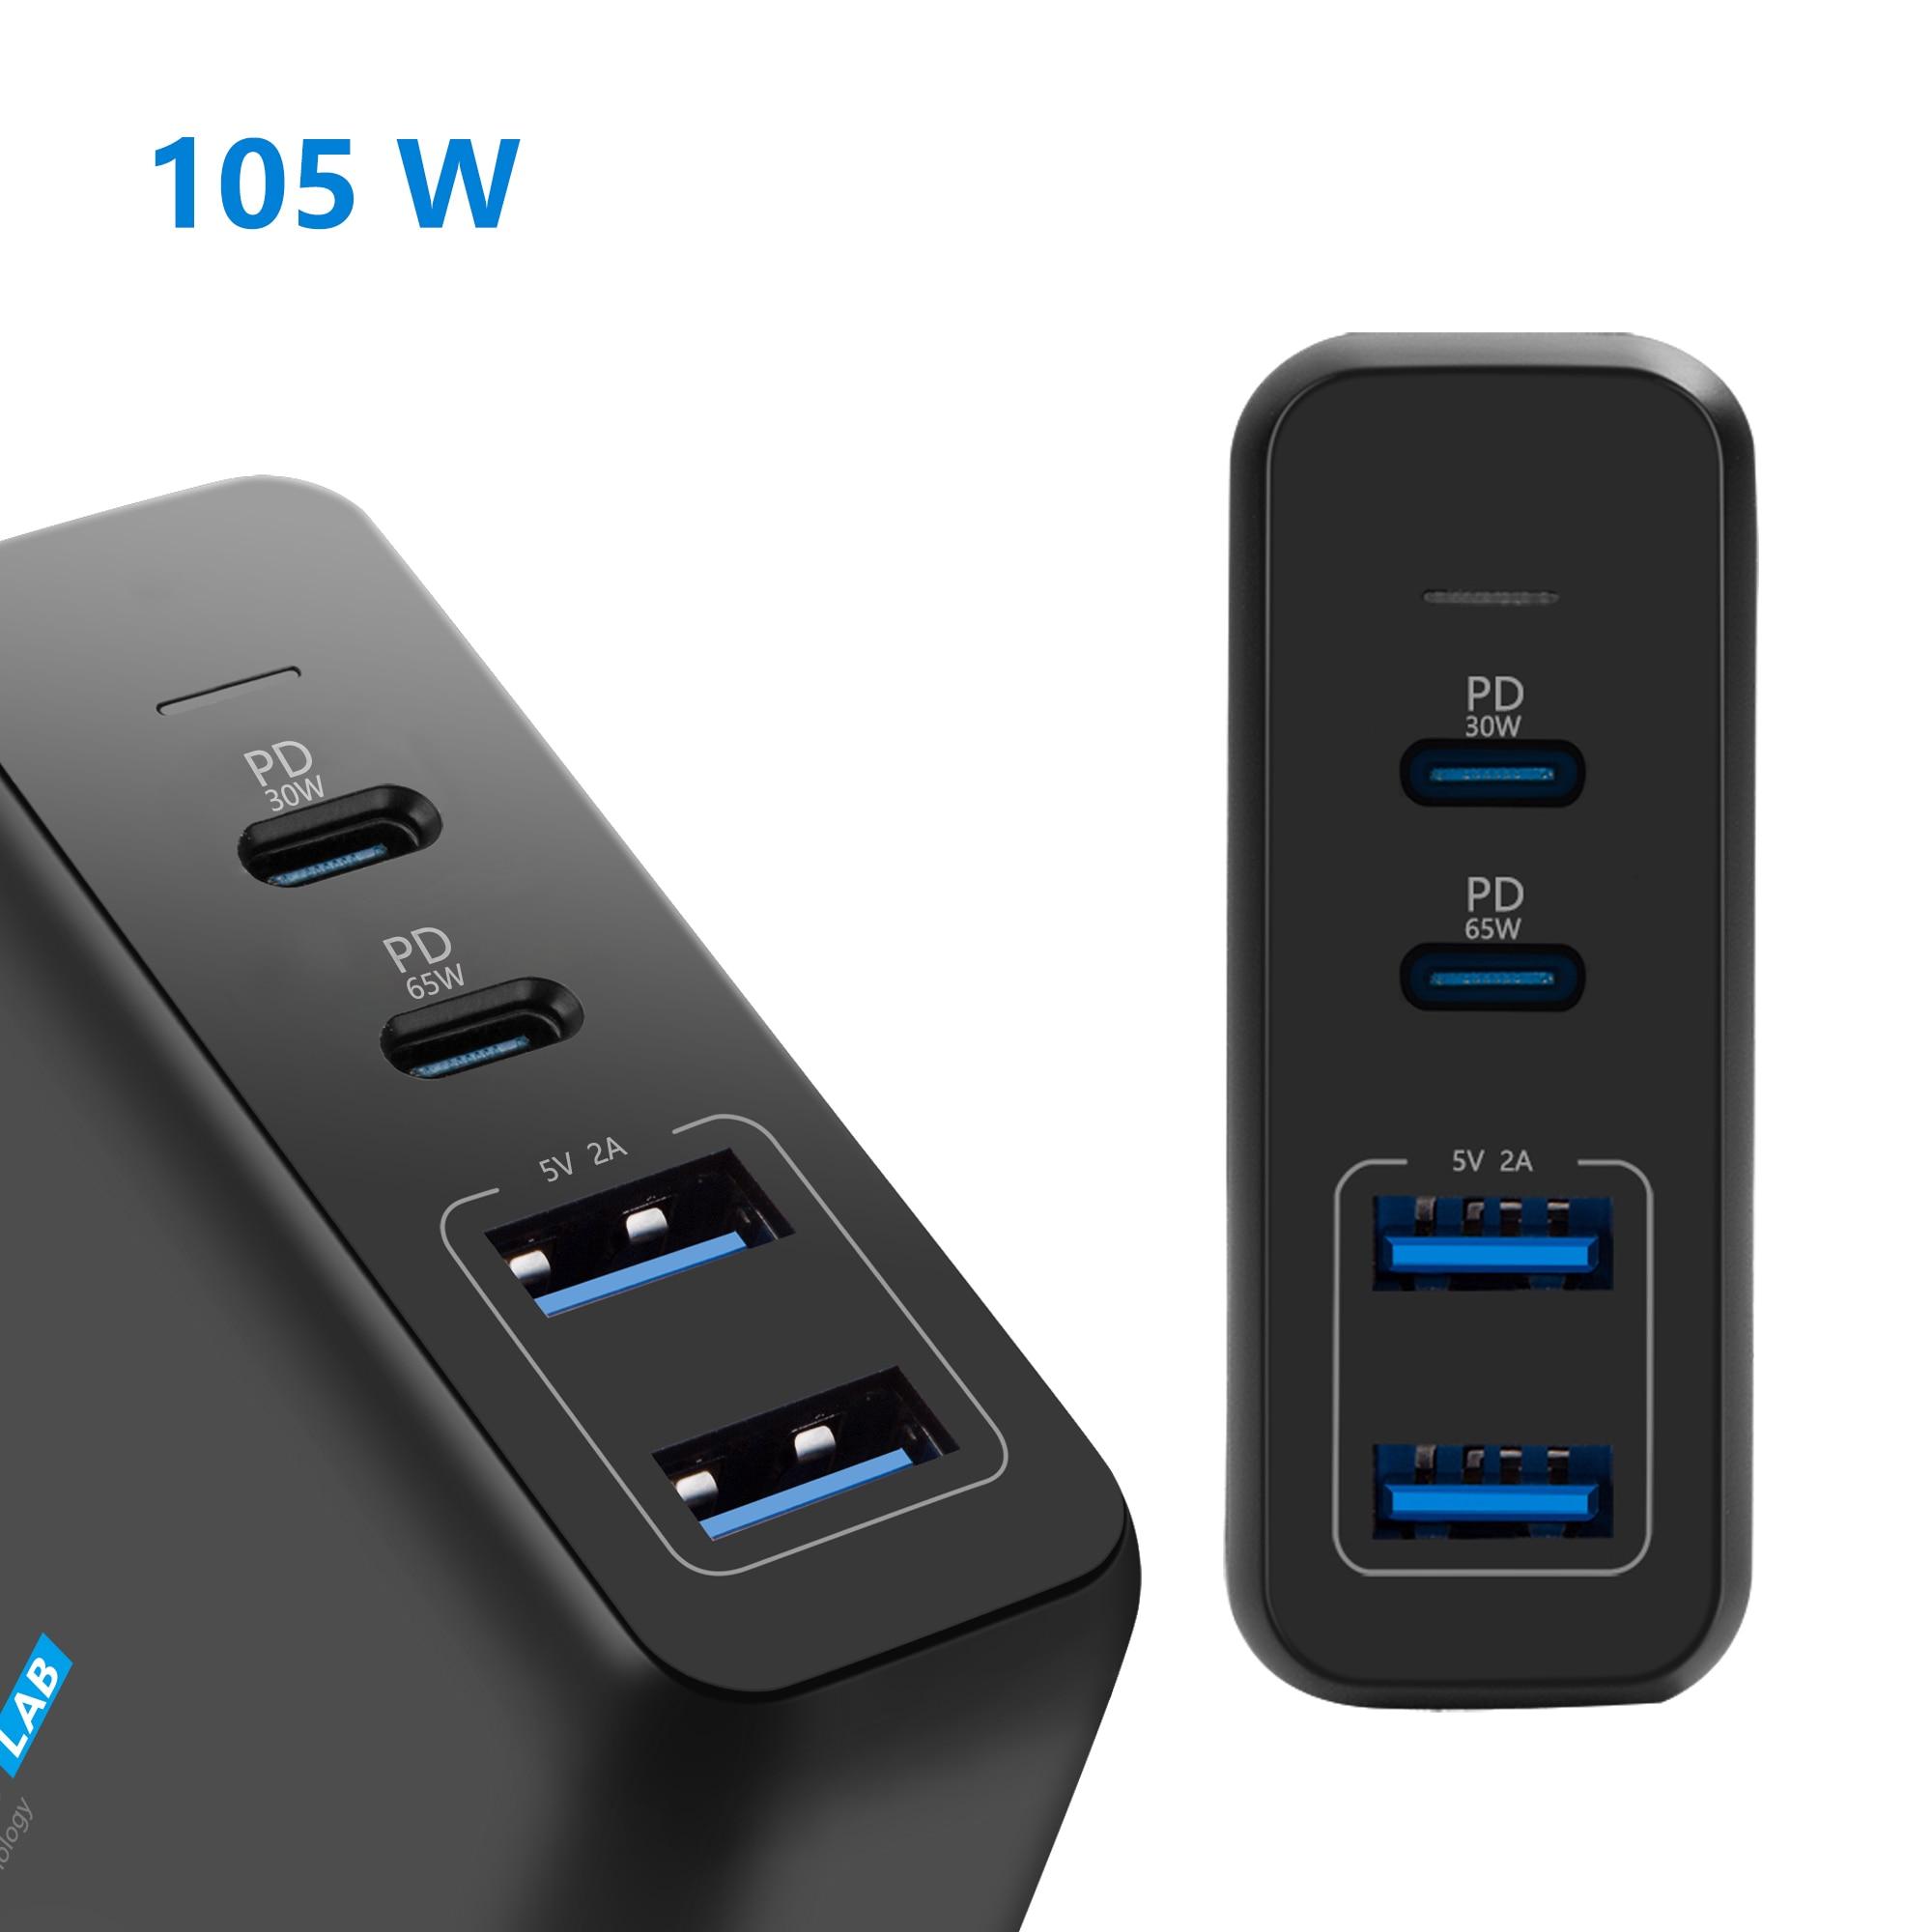 105W Dual ชาร์จ USB USB Type C อะแดปเตอร์ USB C PD สำหรับ MacBook Xiaomi HP Dell XPS iPhone 11 pro และอุปกรณ์ Type C ส่วนใหญ่-ใน อะแดปเตอร์แล็ปท็อป จาก คอมพิวเตอร์และออฟฟิศ บน AliExpress - 11.11_สิบเอ็ด สิบเอ็ดวันคนโสด 1